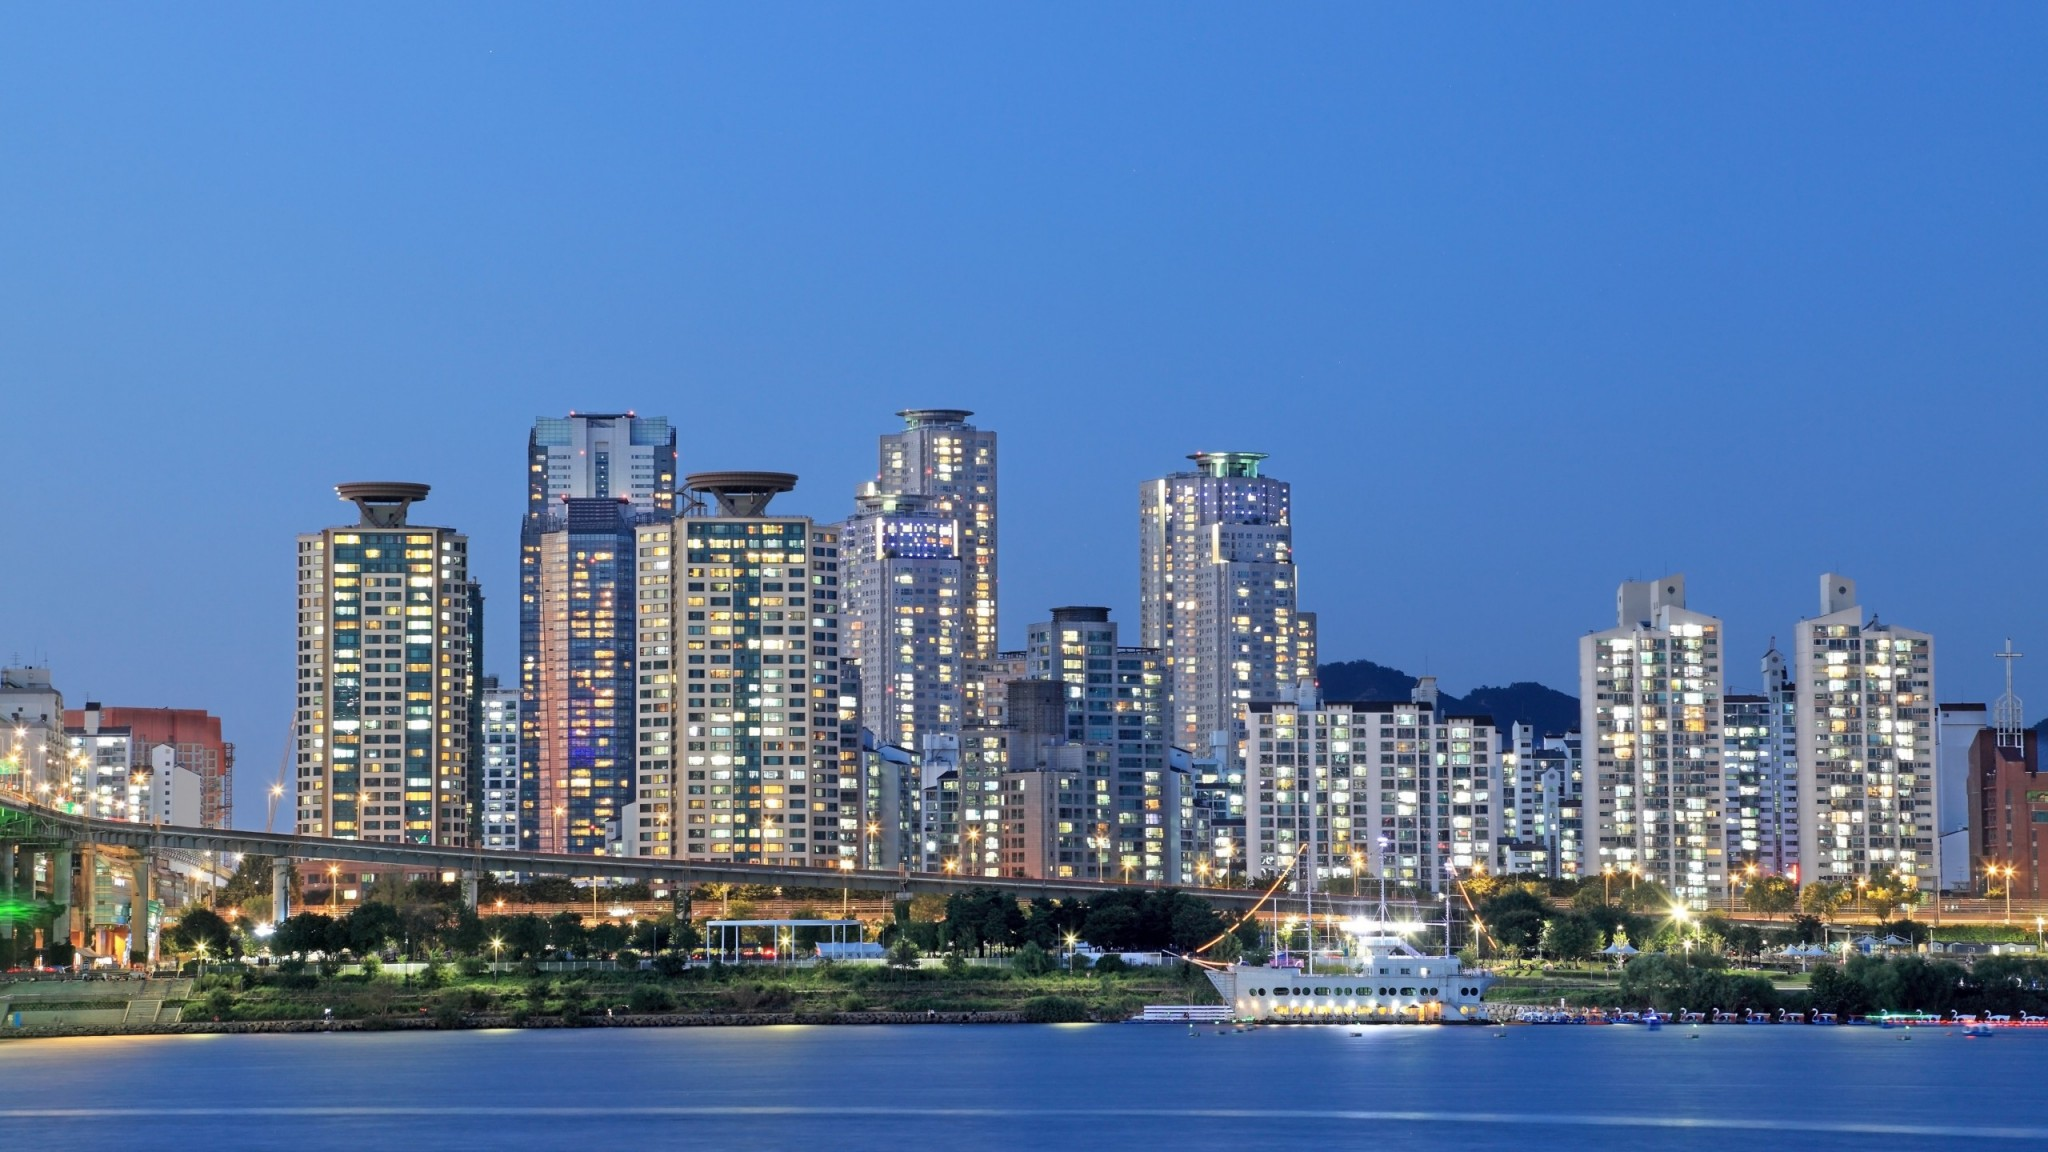 Apartments along Han River